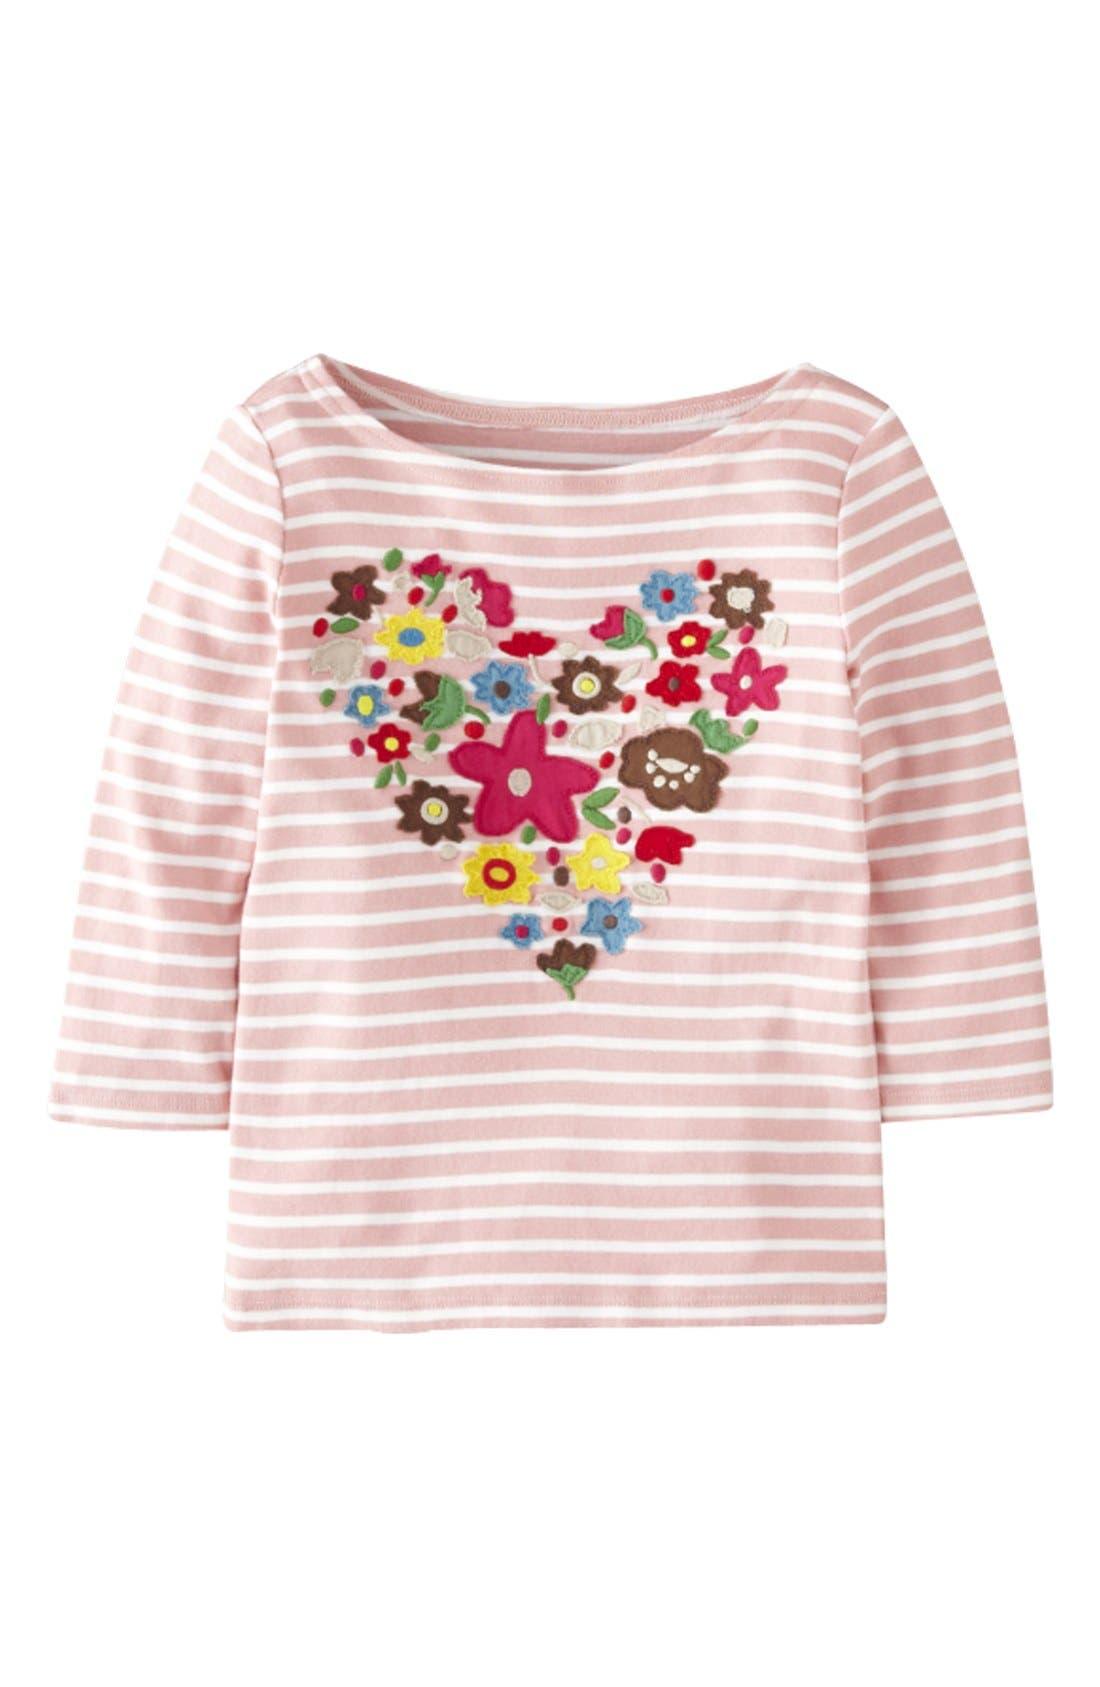 Main Image - Mini Boden 'Big Bloom' Appliqué Tee (Toddler Girls, Little Girls & Big Girls)